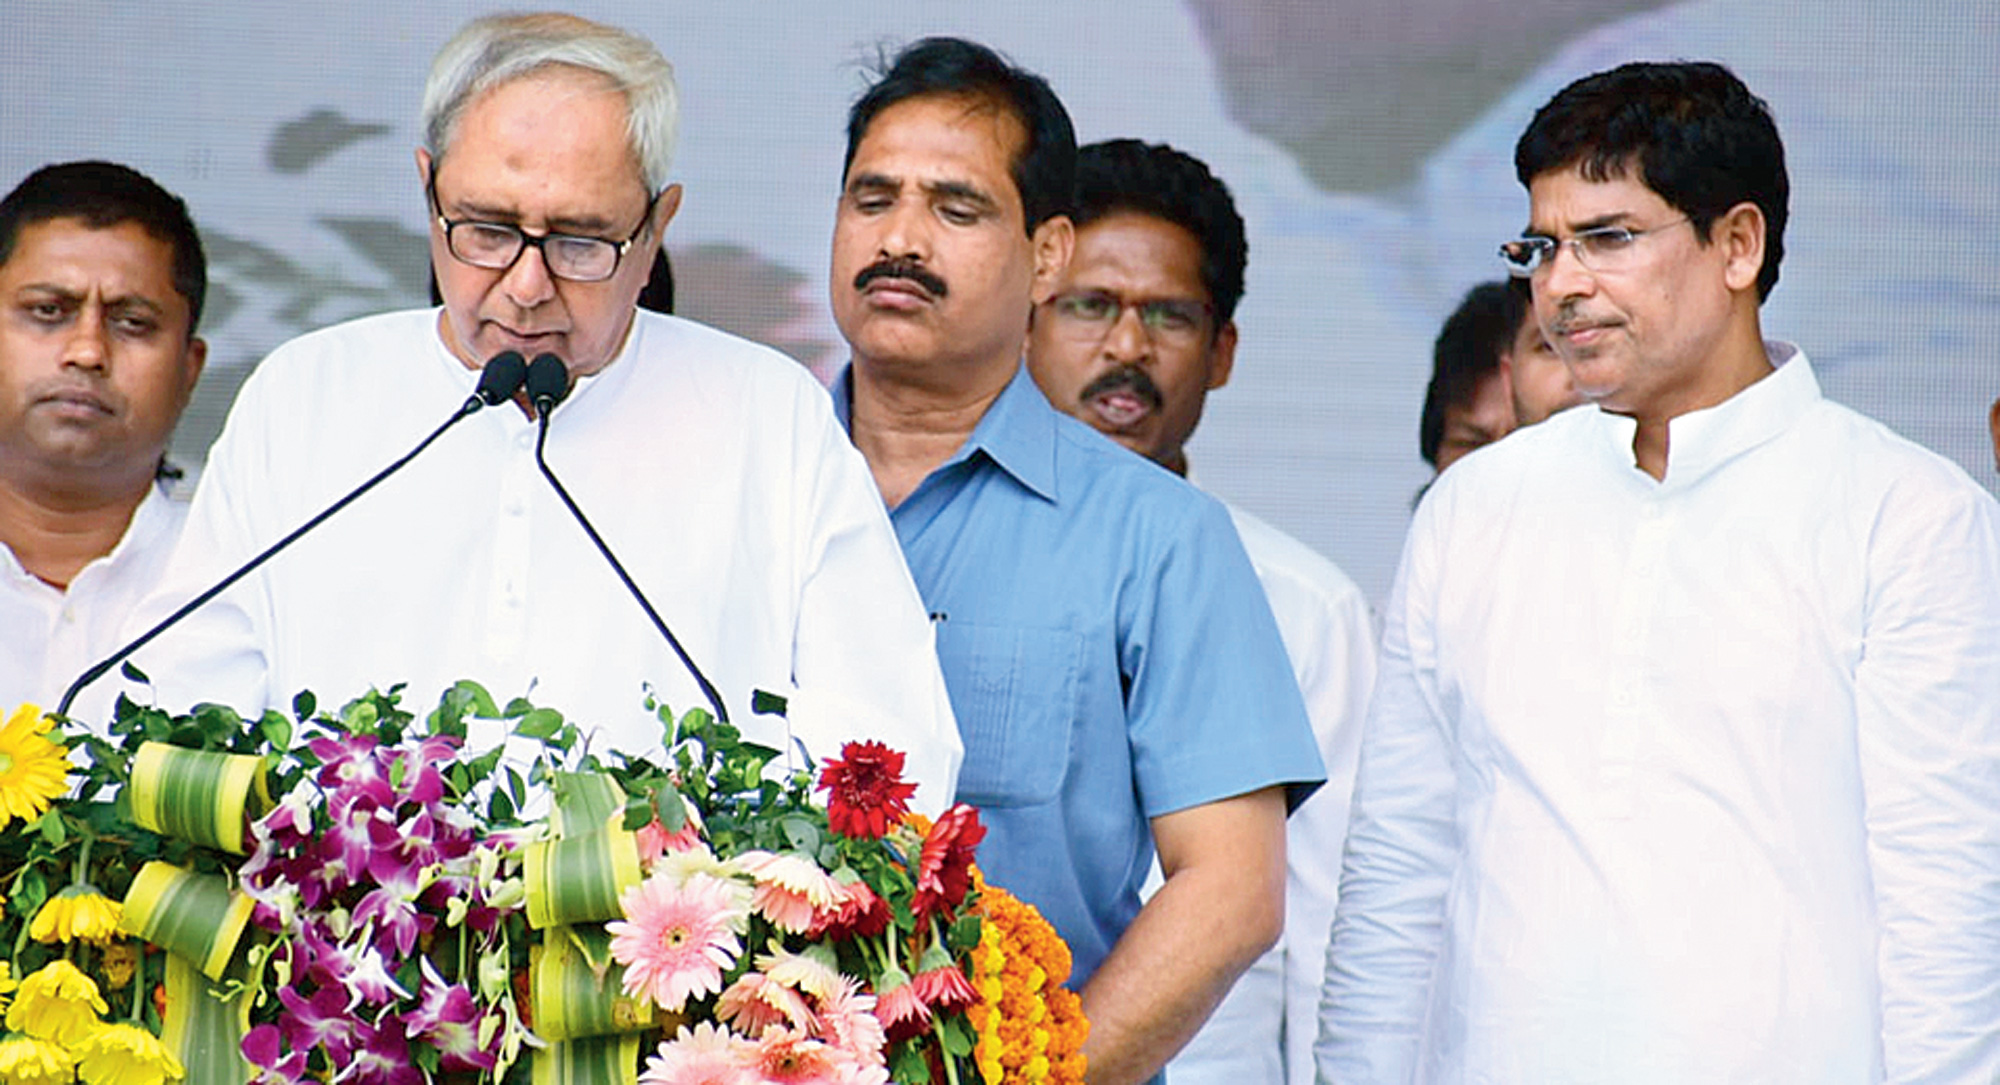 Odisha chief minister Naveen Patnaik at the public meeting in Nayagarh on Sunday.